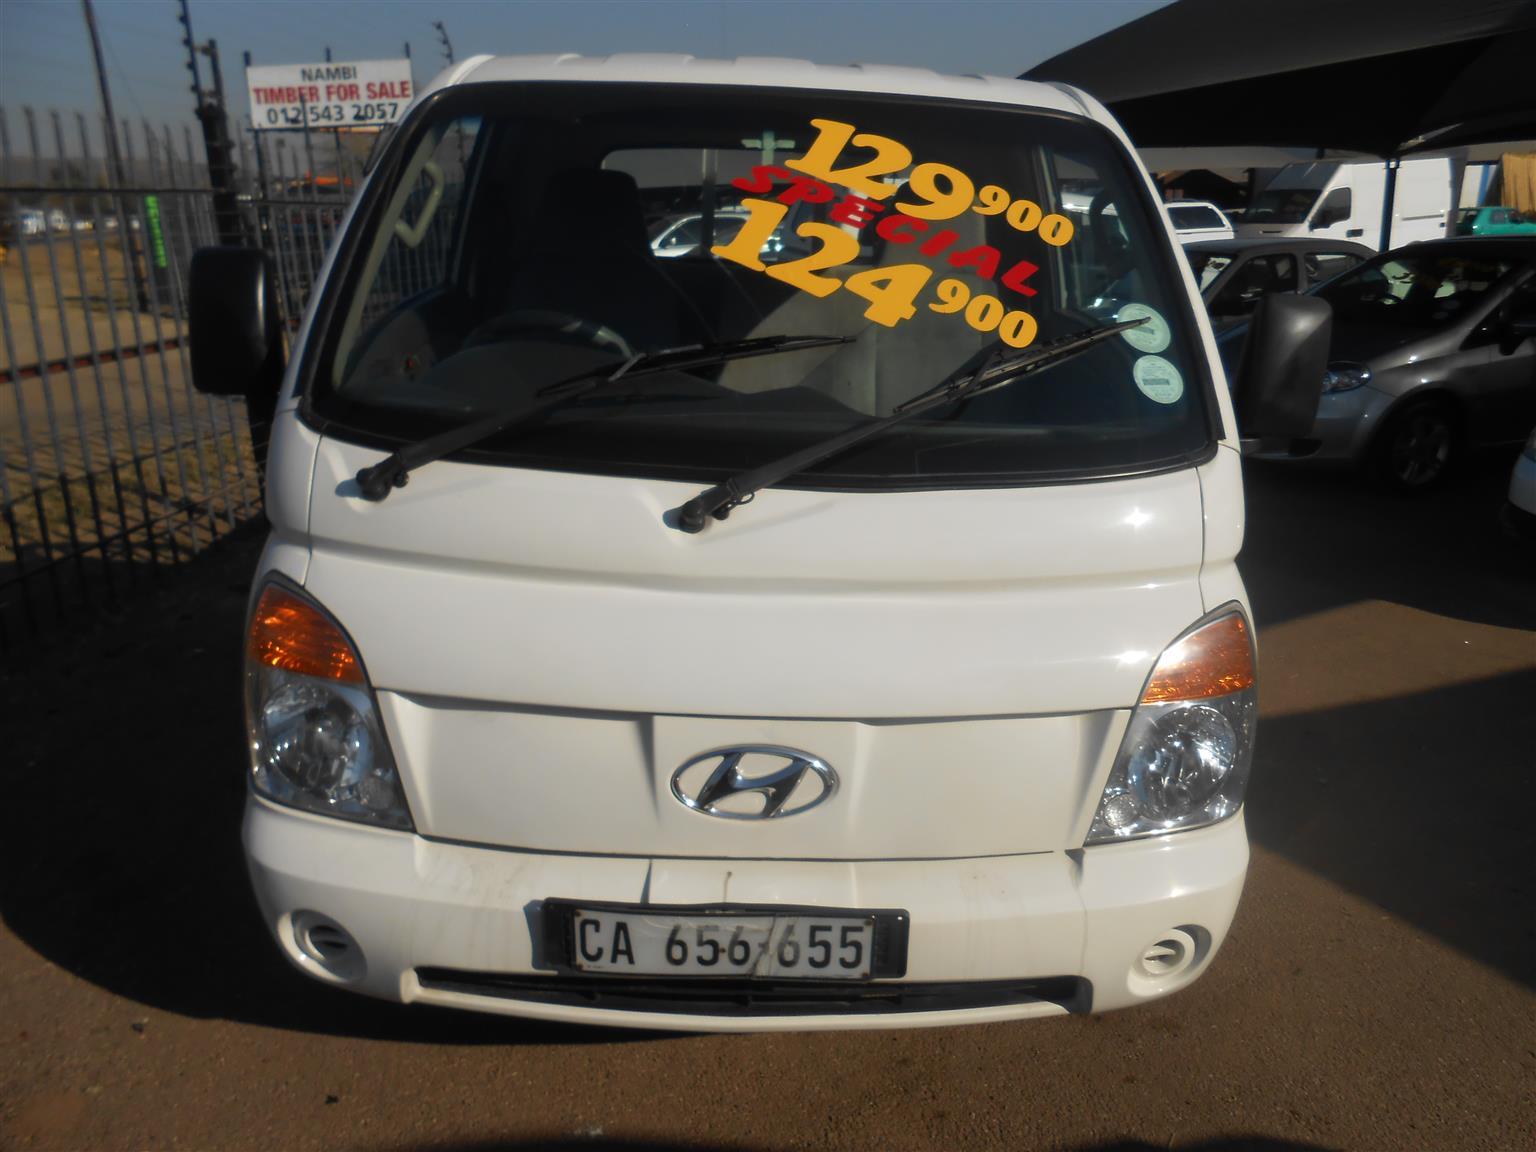 2006 Hyundai H-100 Bakkie 2.6D chassis cab